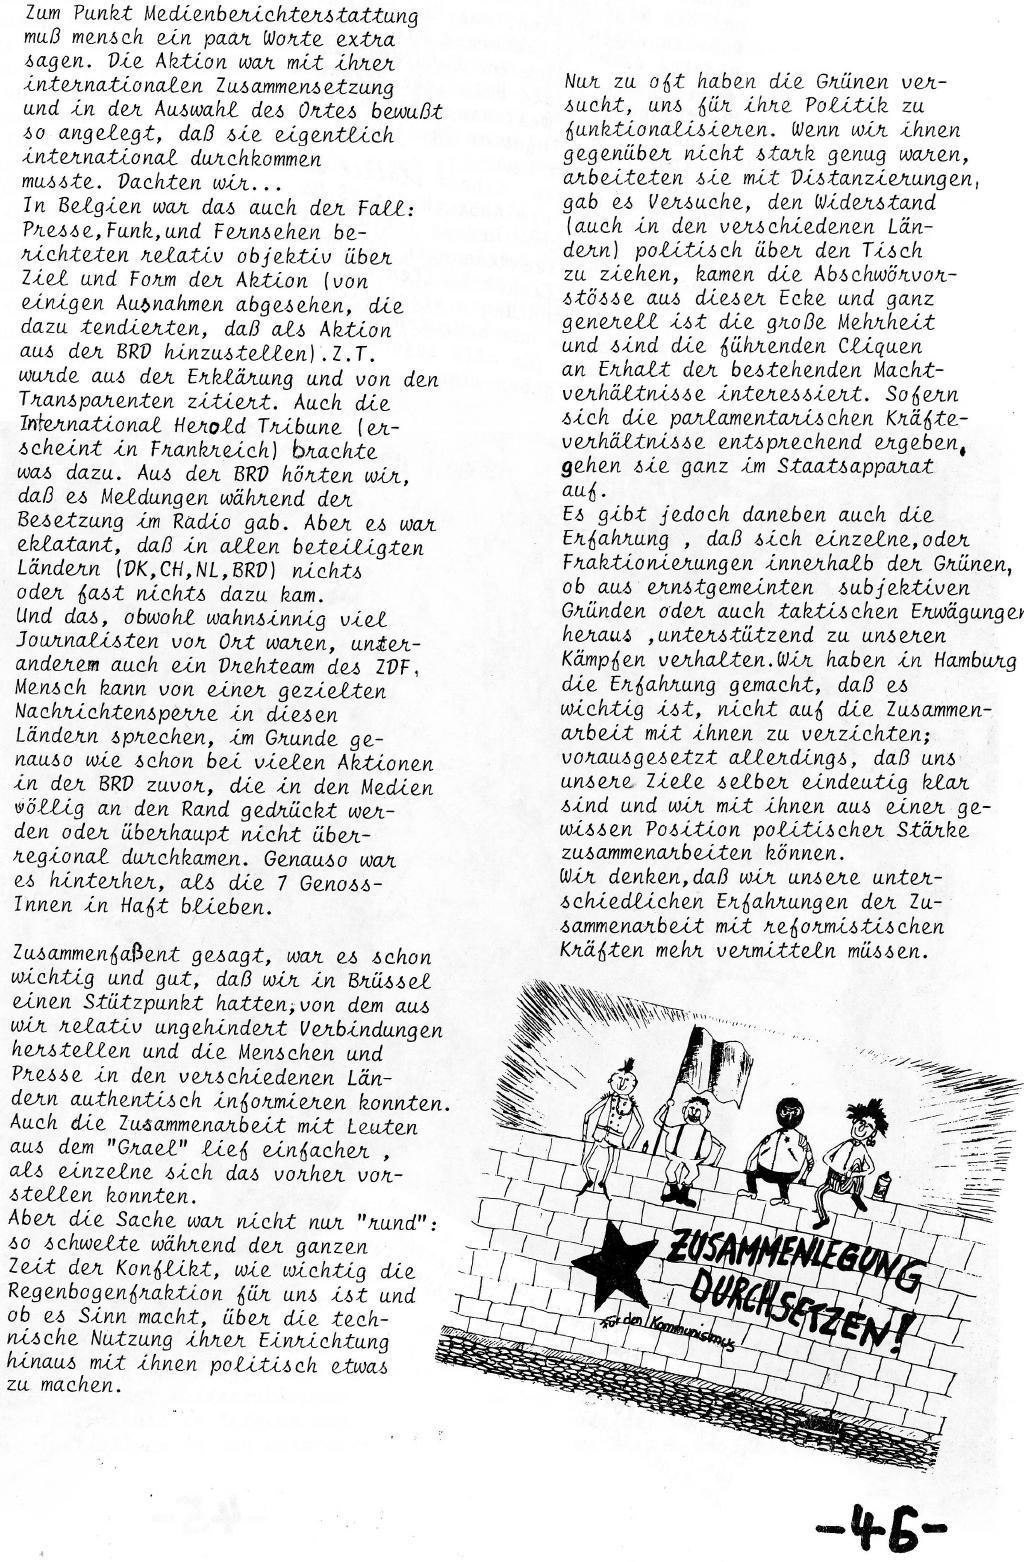 Belgien_Doku_Besetzung_EG_Kommission_1989_048